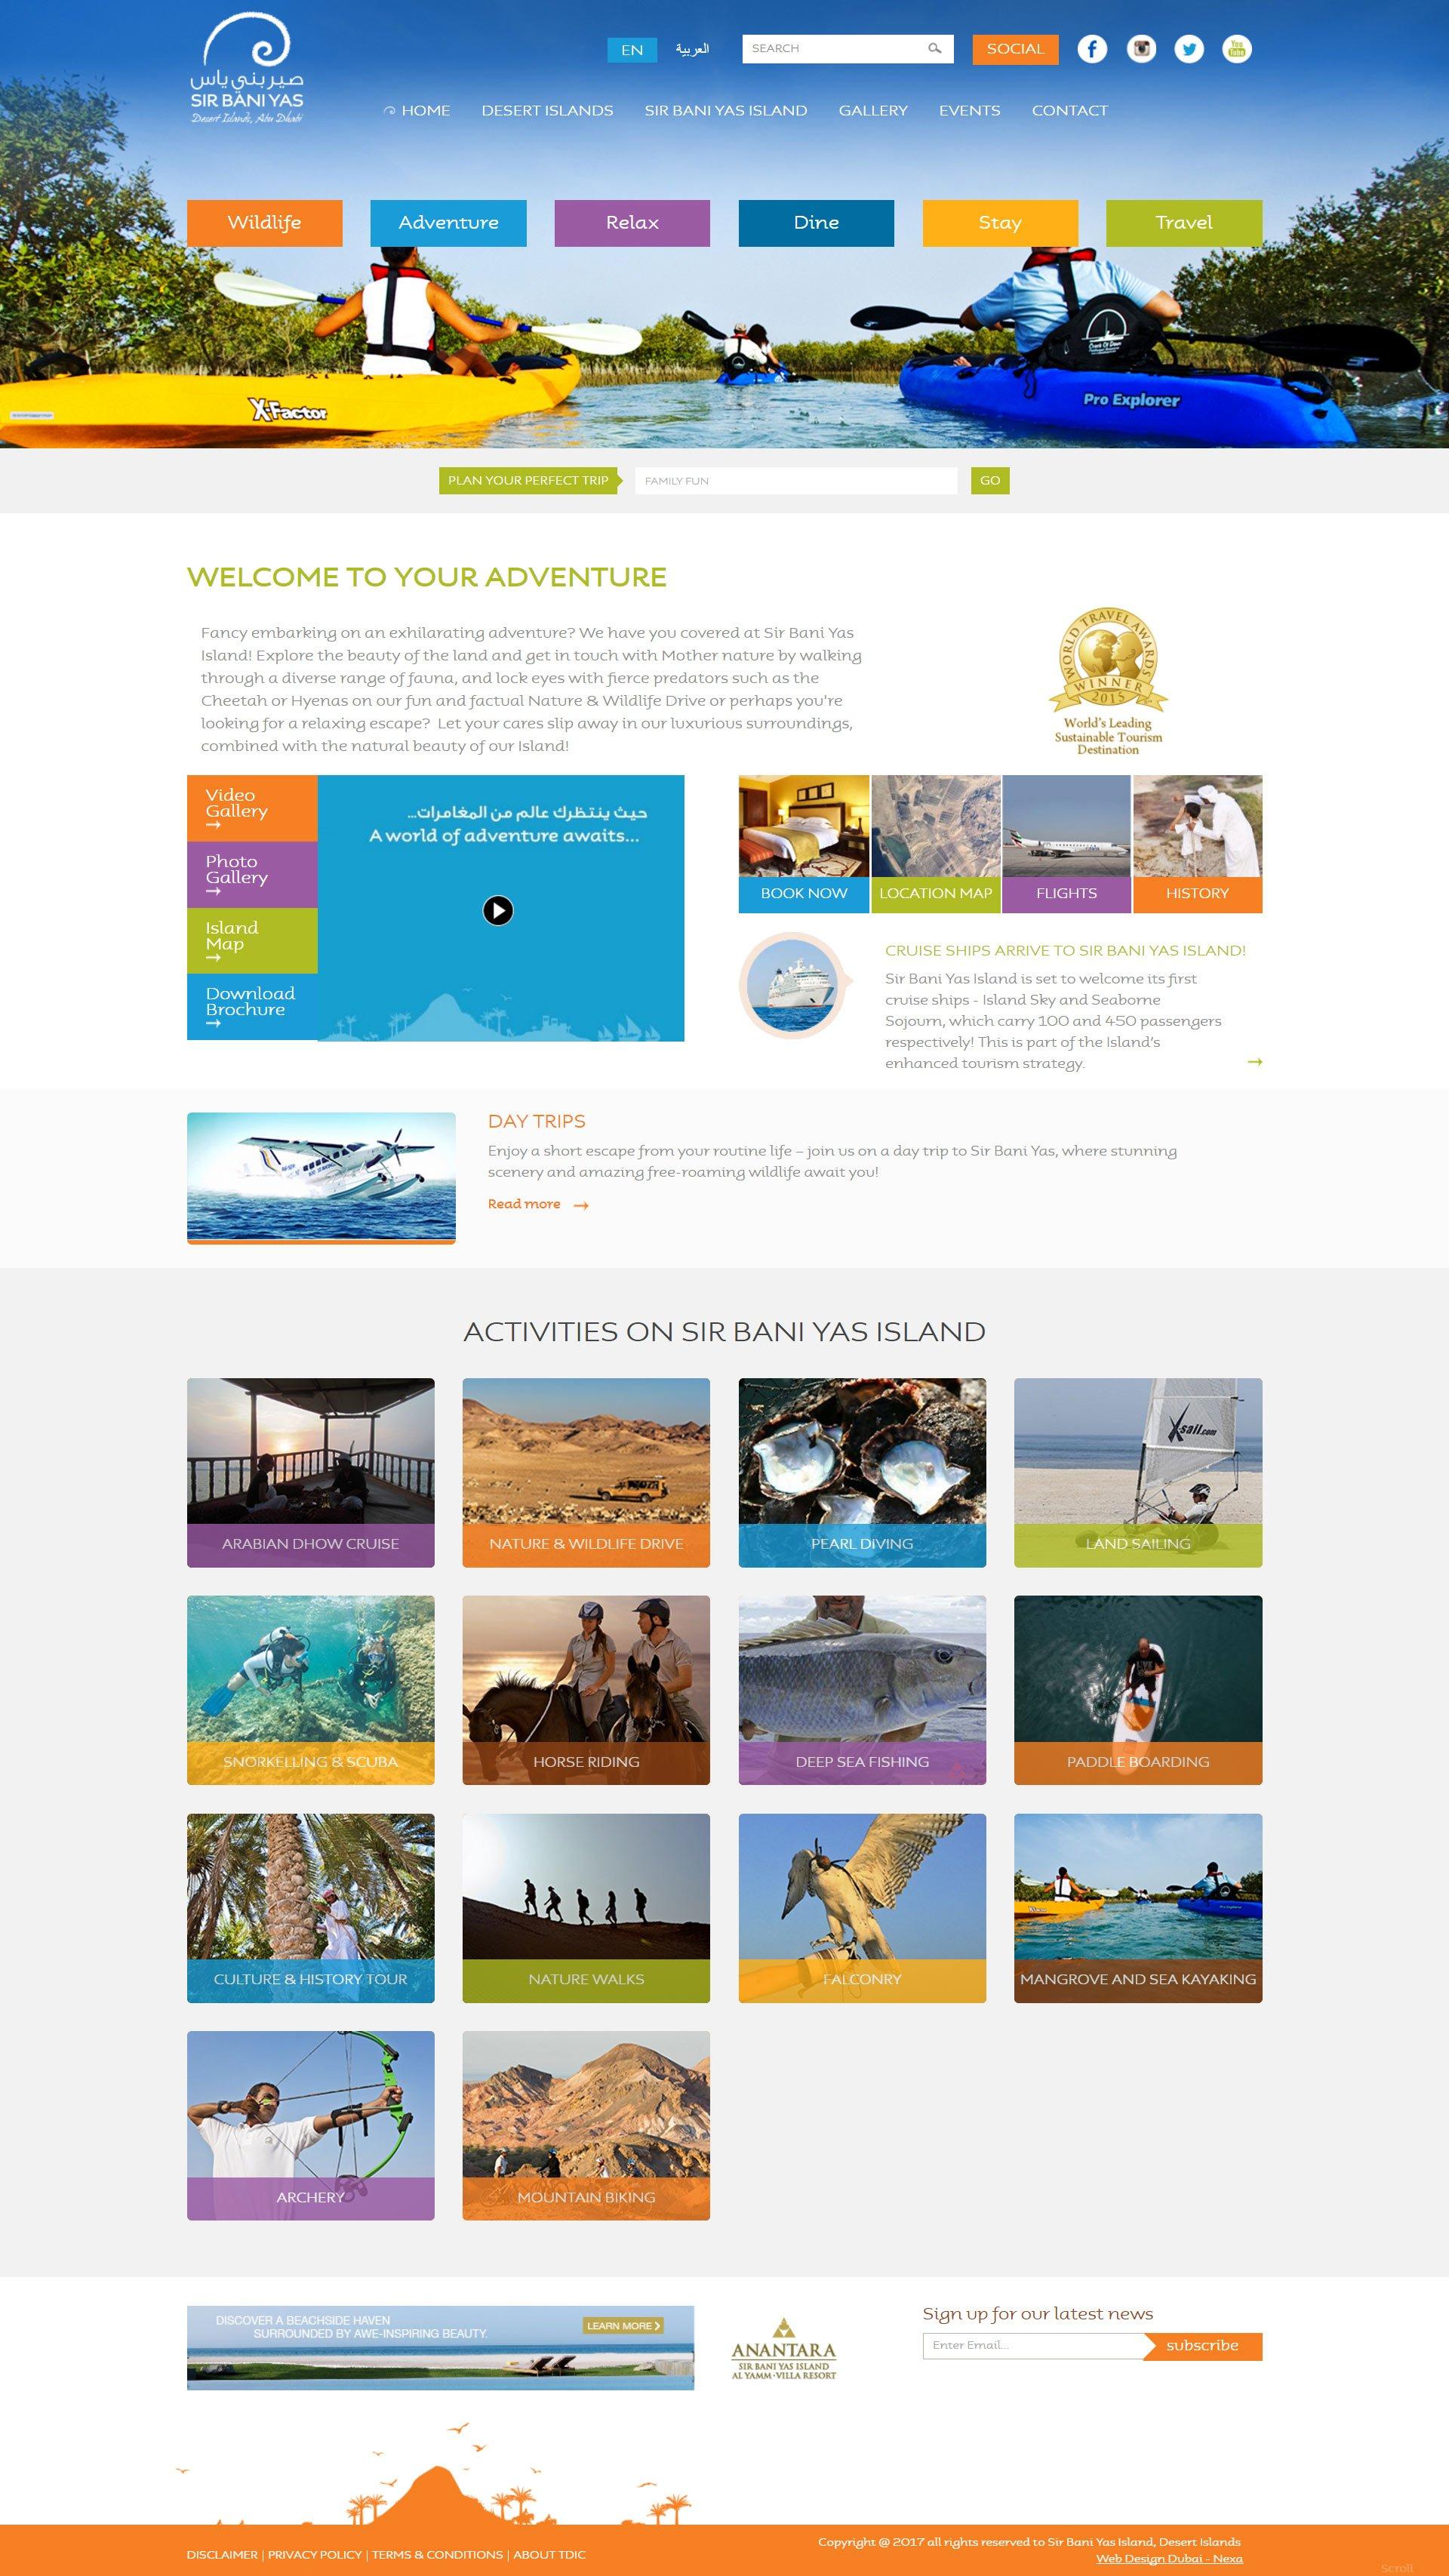 Sir Bani Yas Island Website by Nexa, Dubai